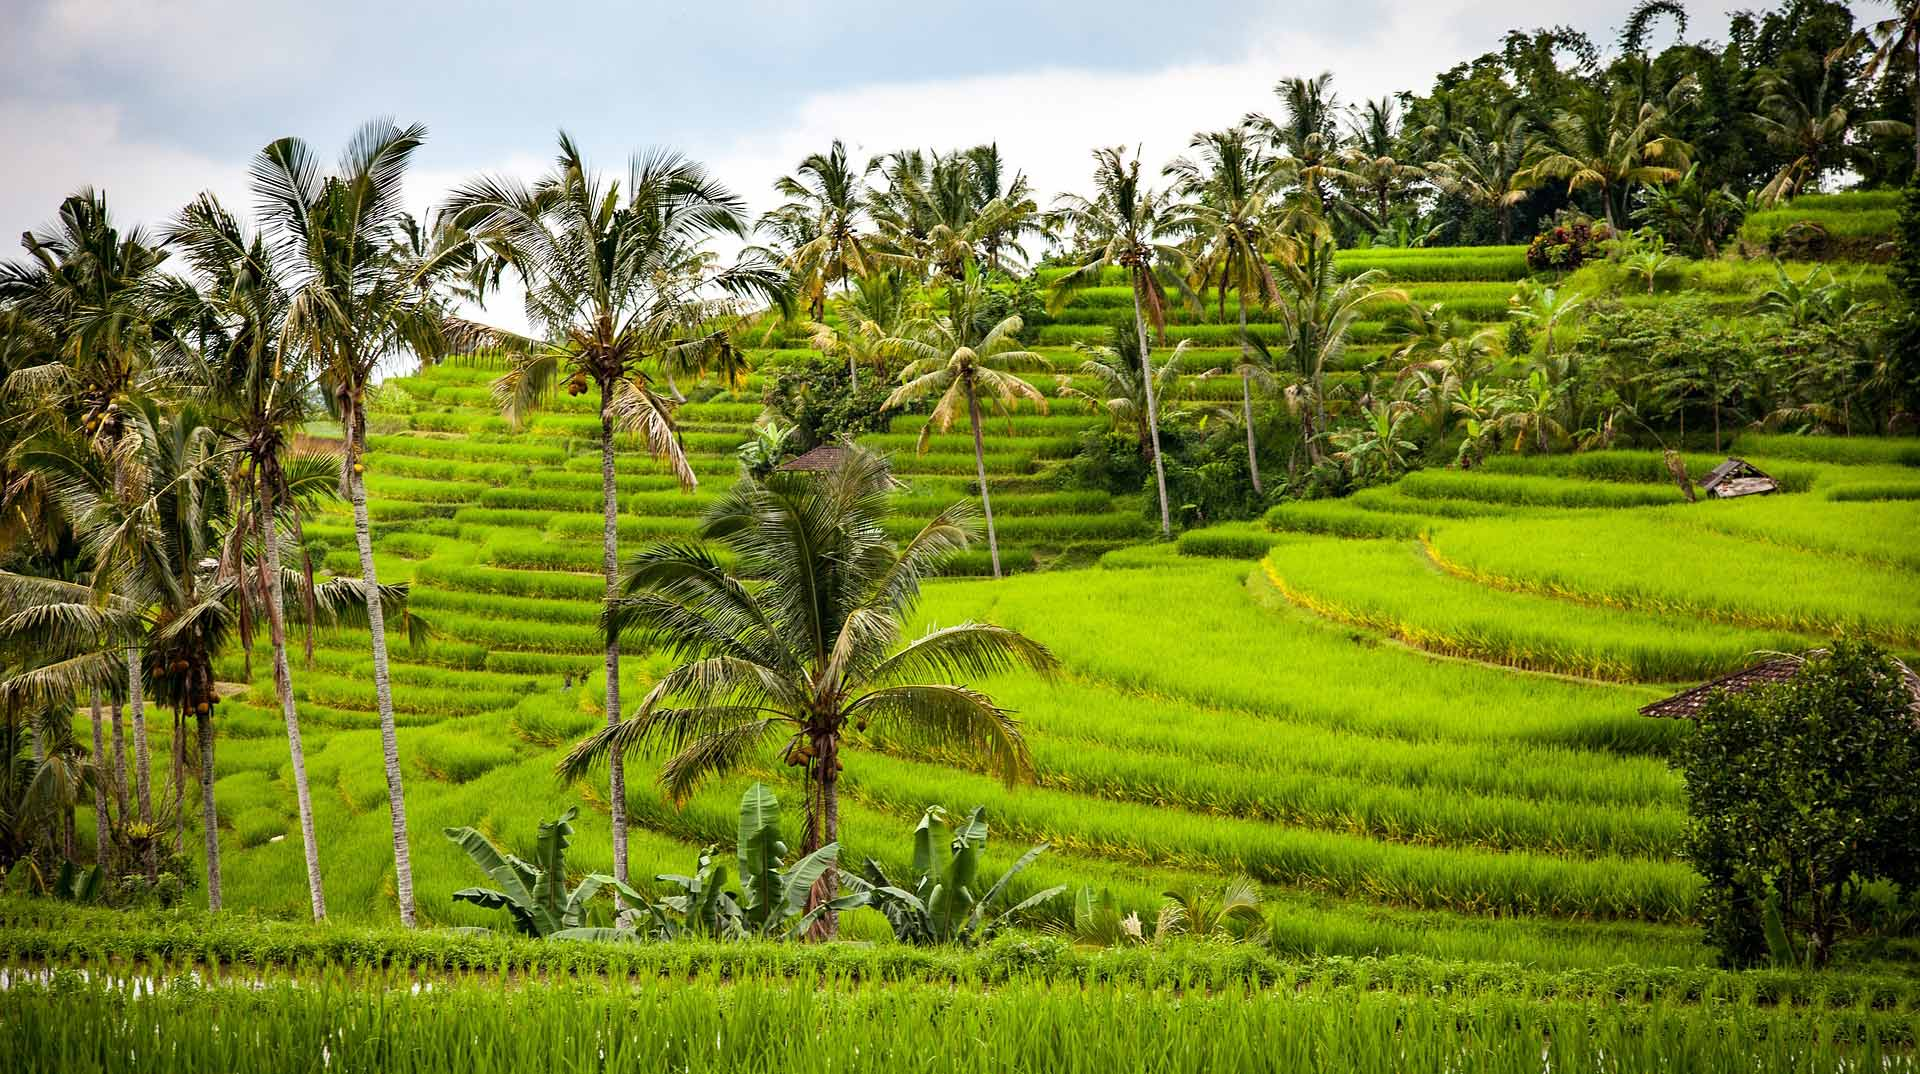 Bali - Lytchee